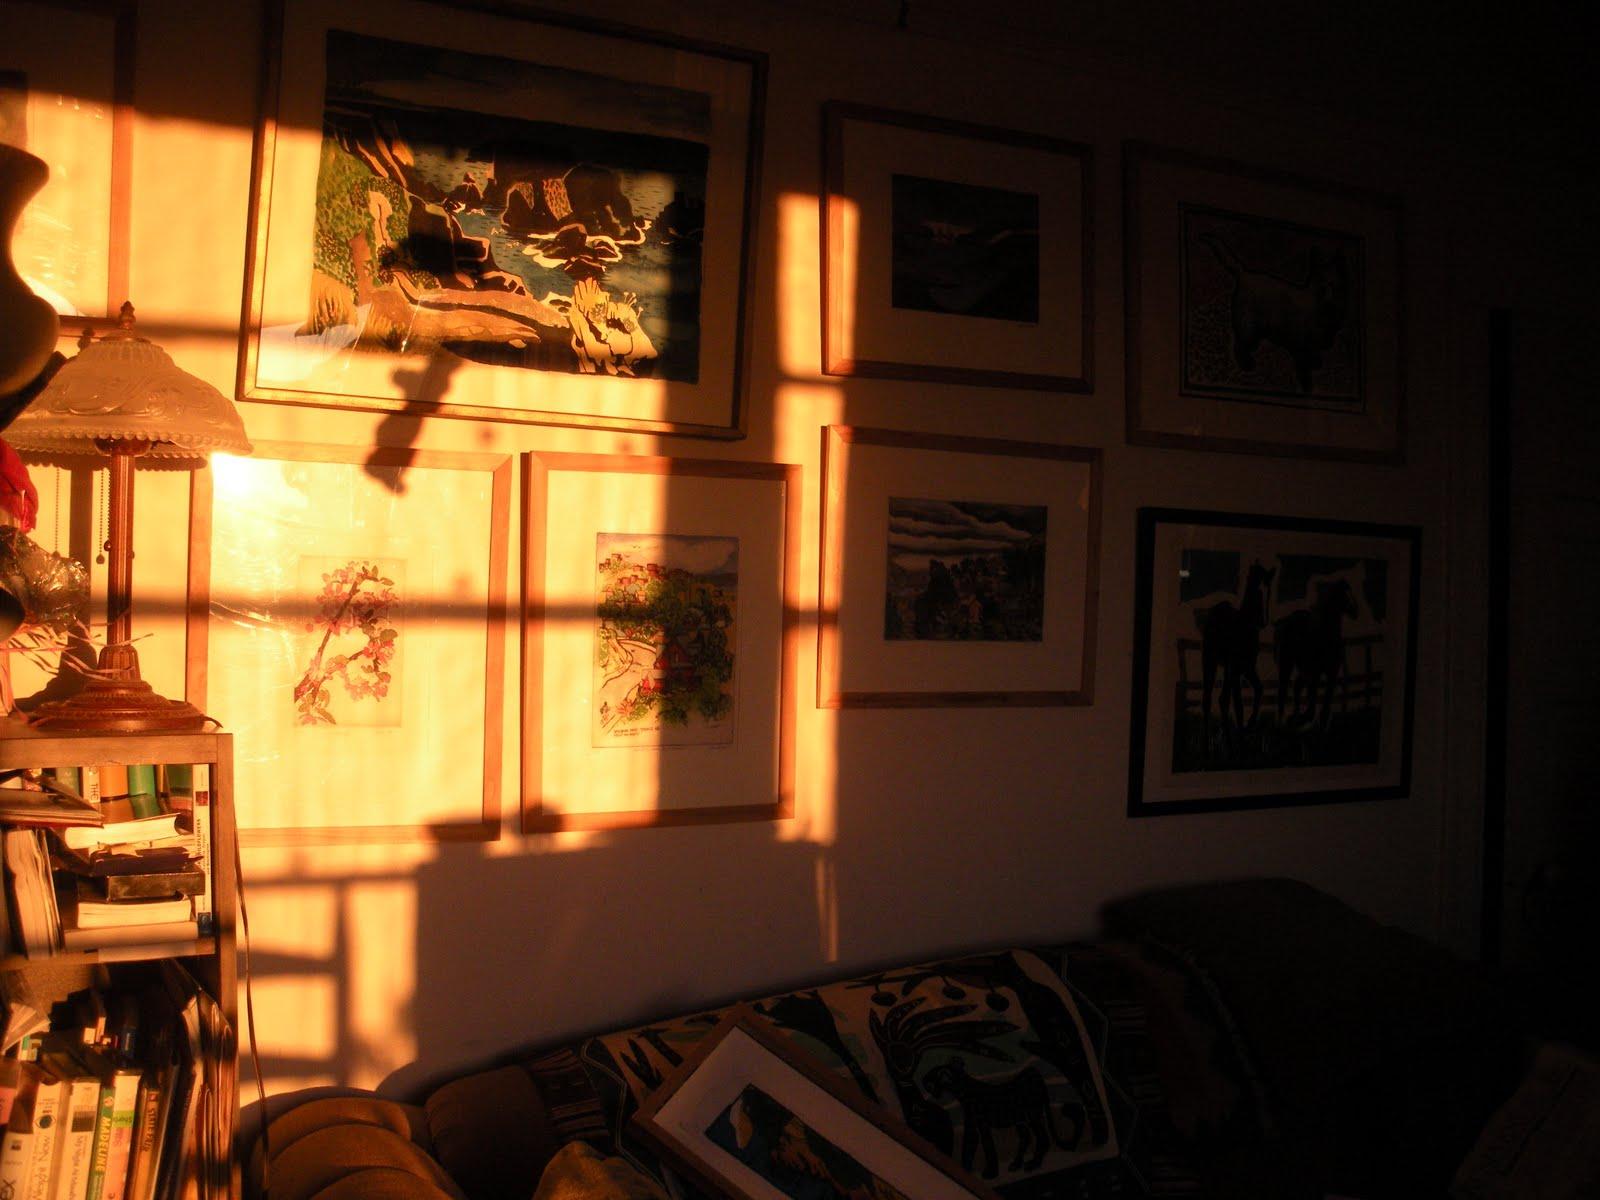 [sun+afternoon]